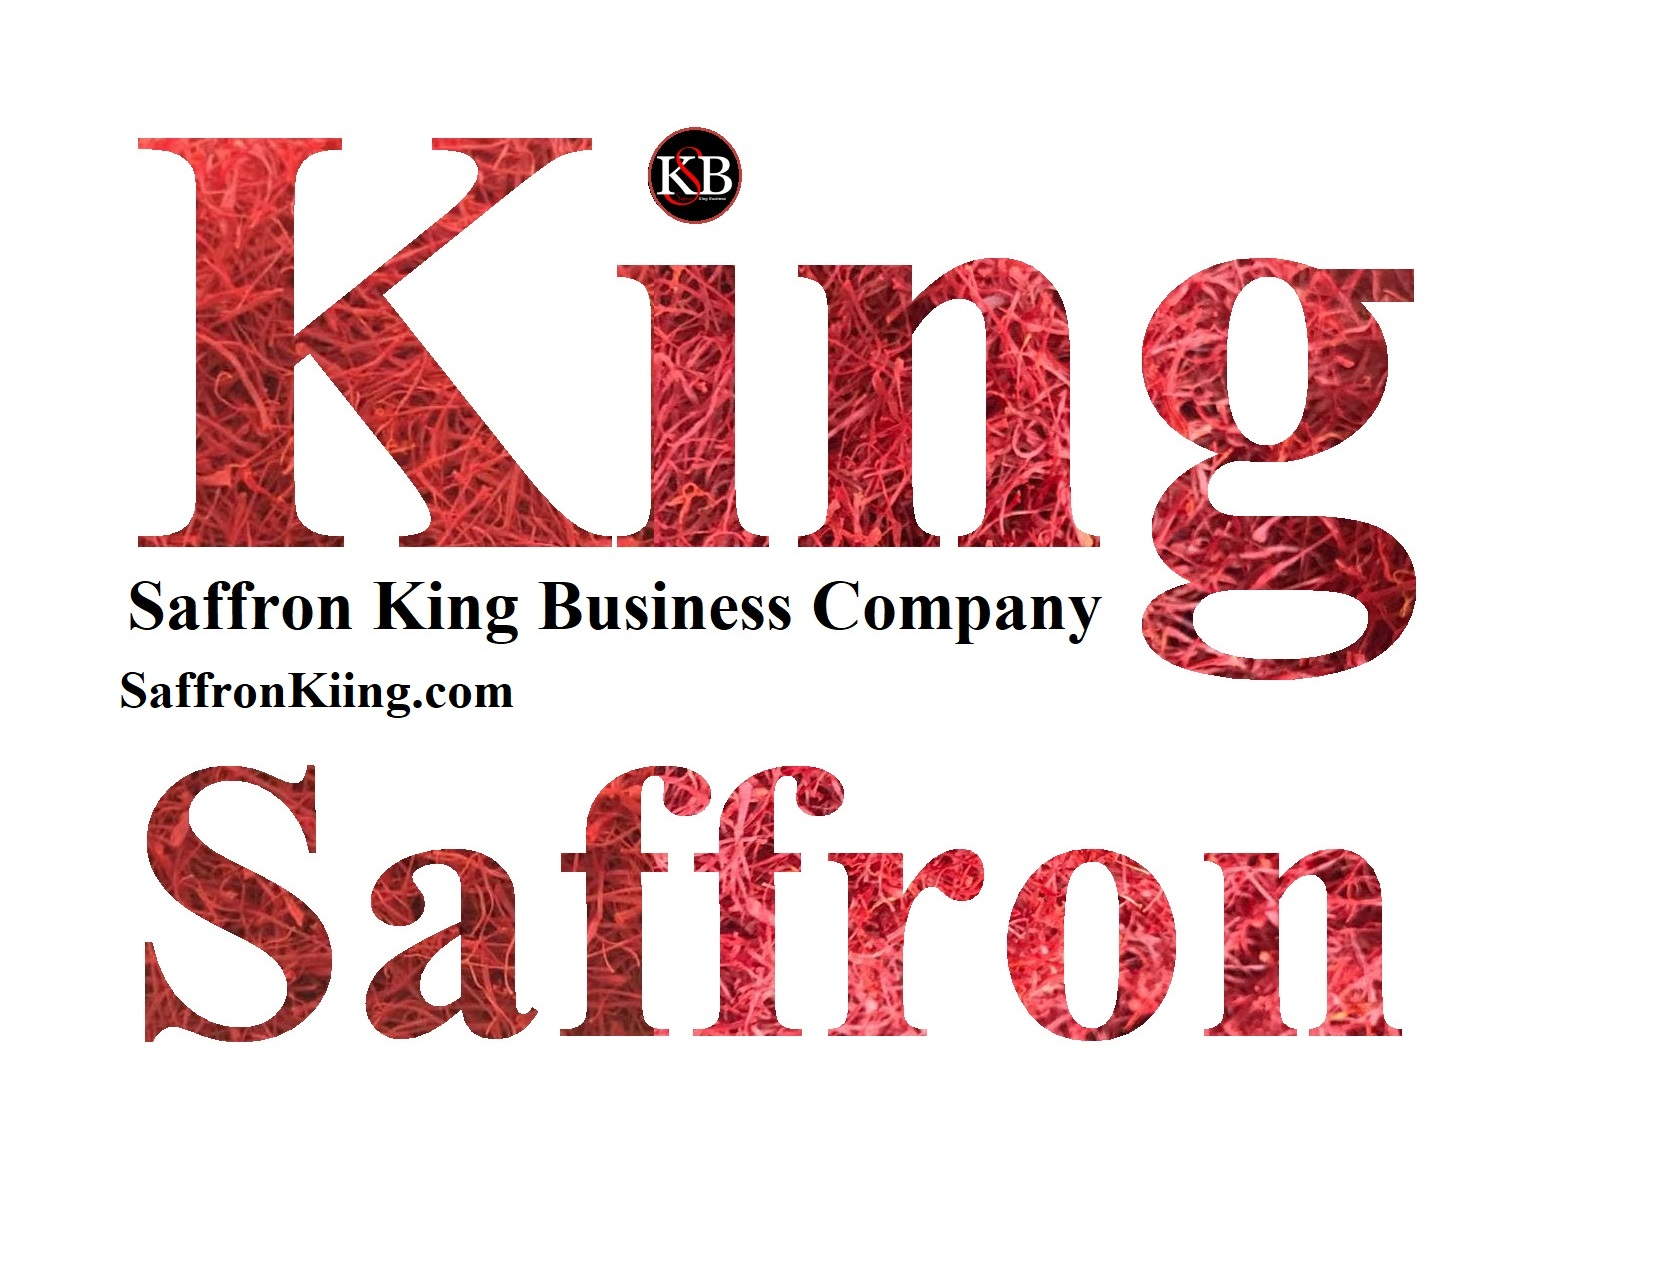 Big seller of saffron